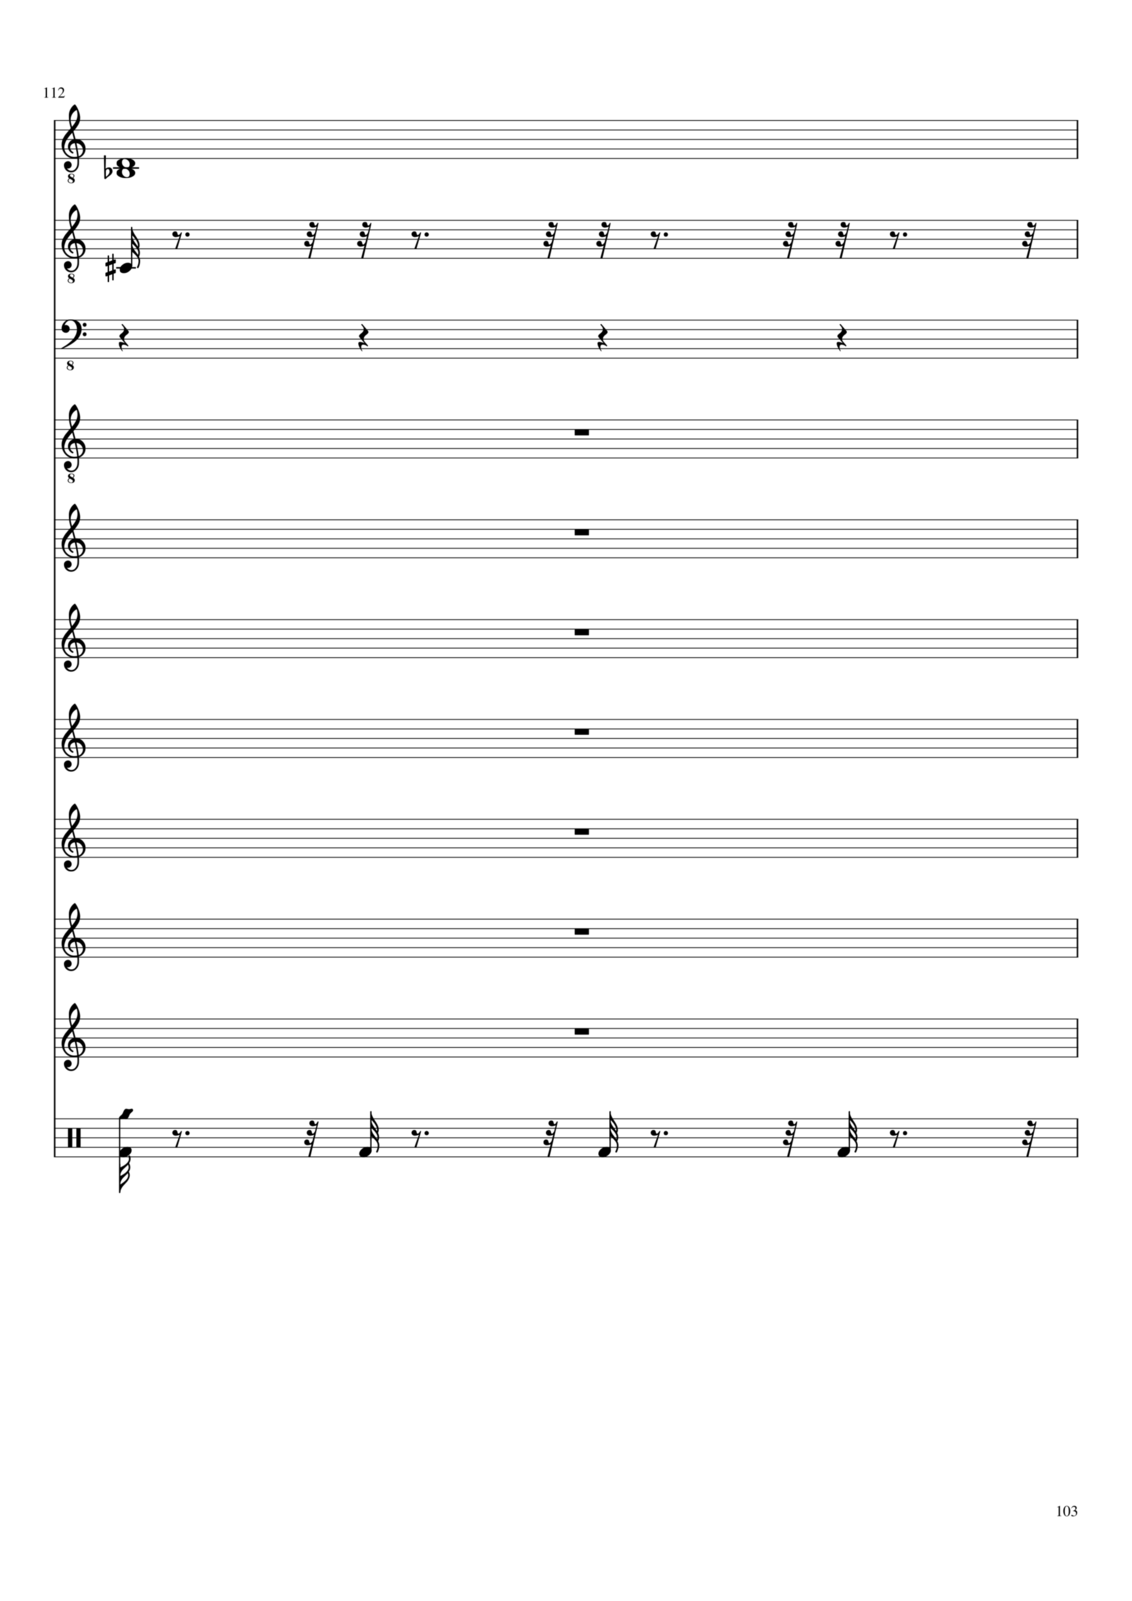 Belyiy sokol slide, Image 103